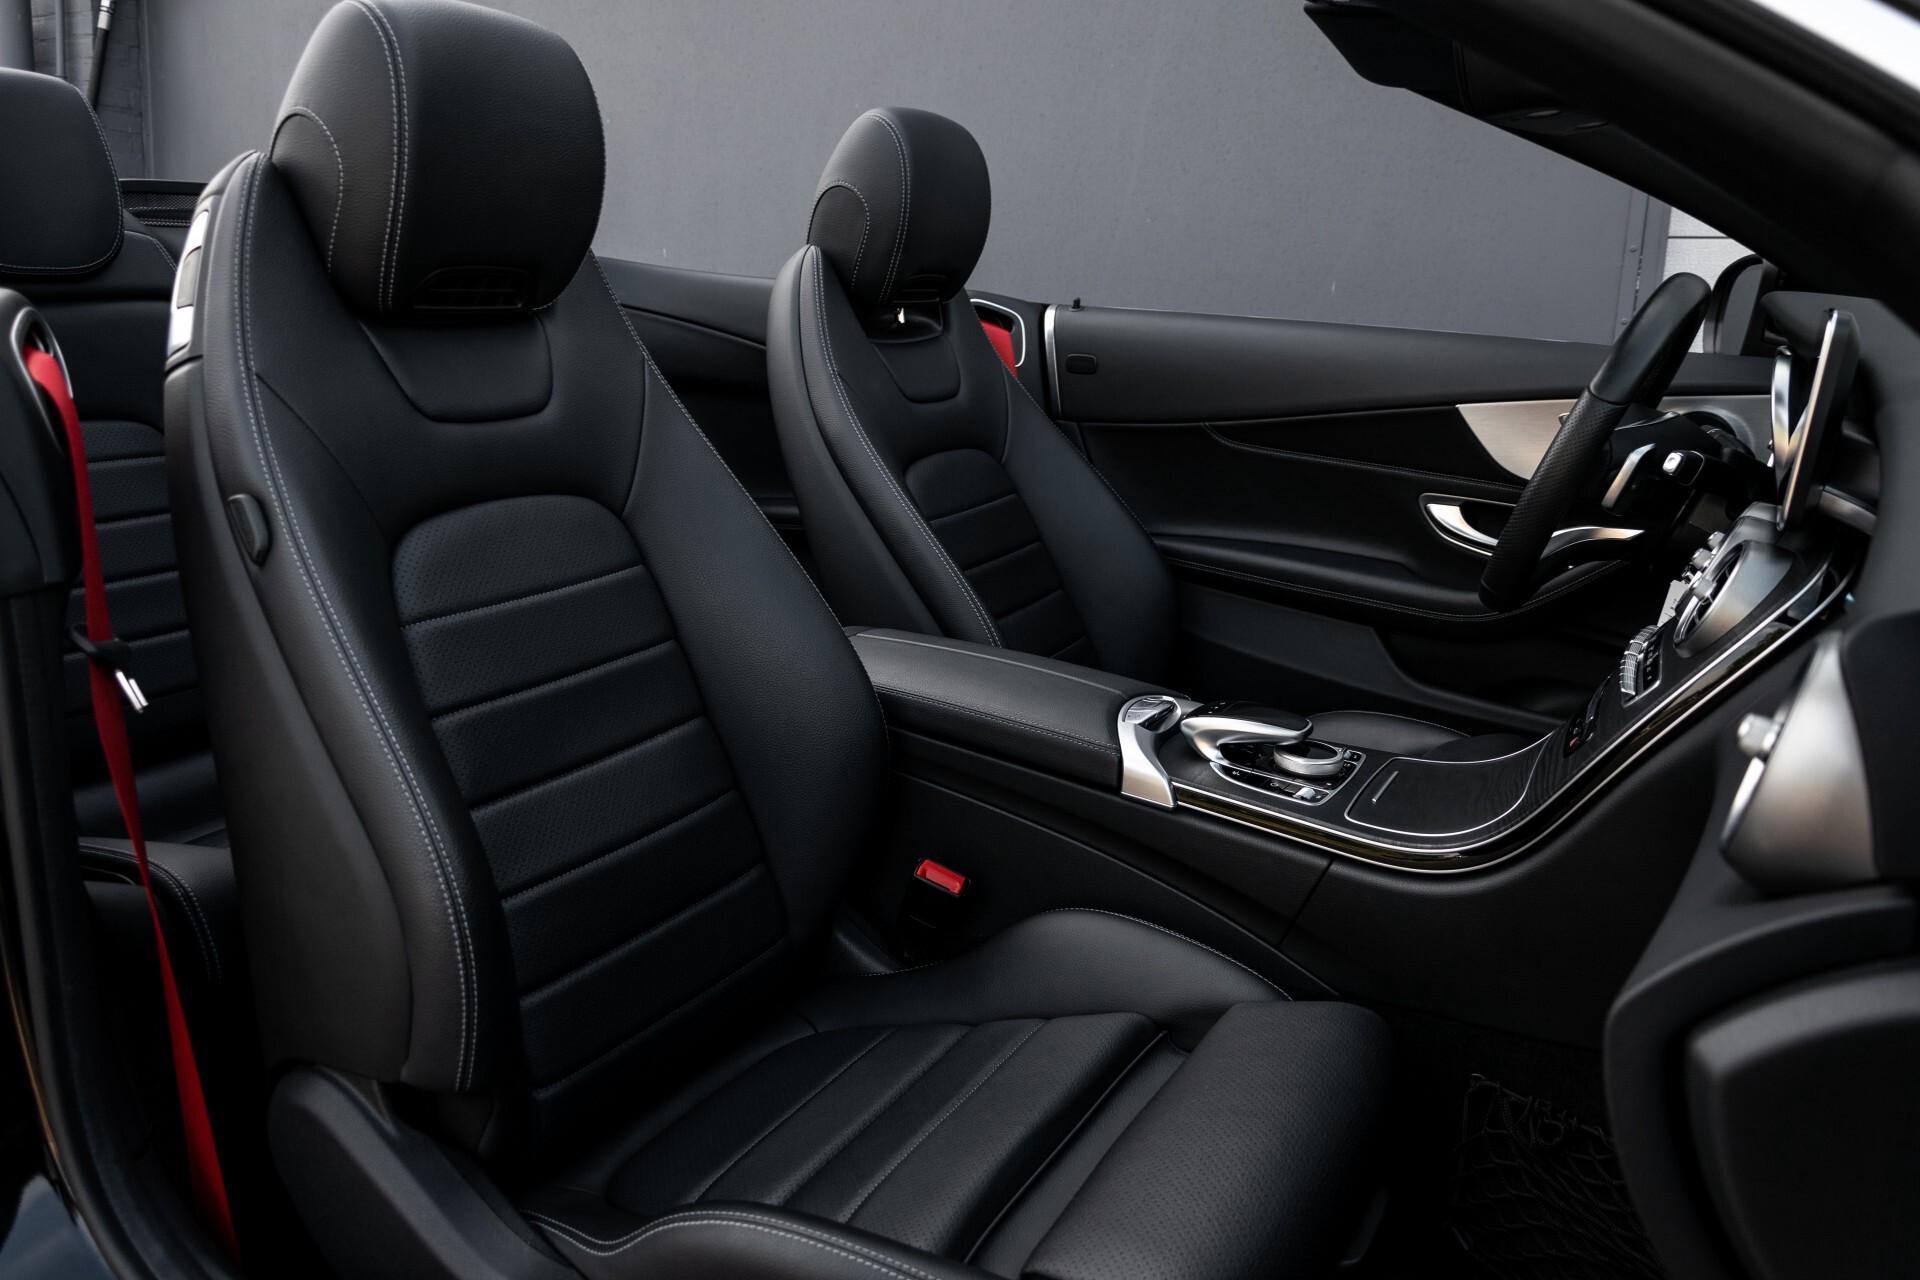 Mercedes-Benz C-Klasse Cabrio 250 AMG Airscarf/Aircap/Comand/ILS/Camera/Rode cabriokap Aut9 Foto 5